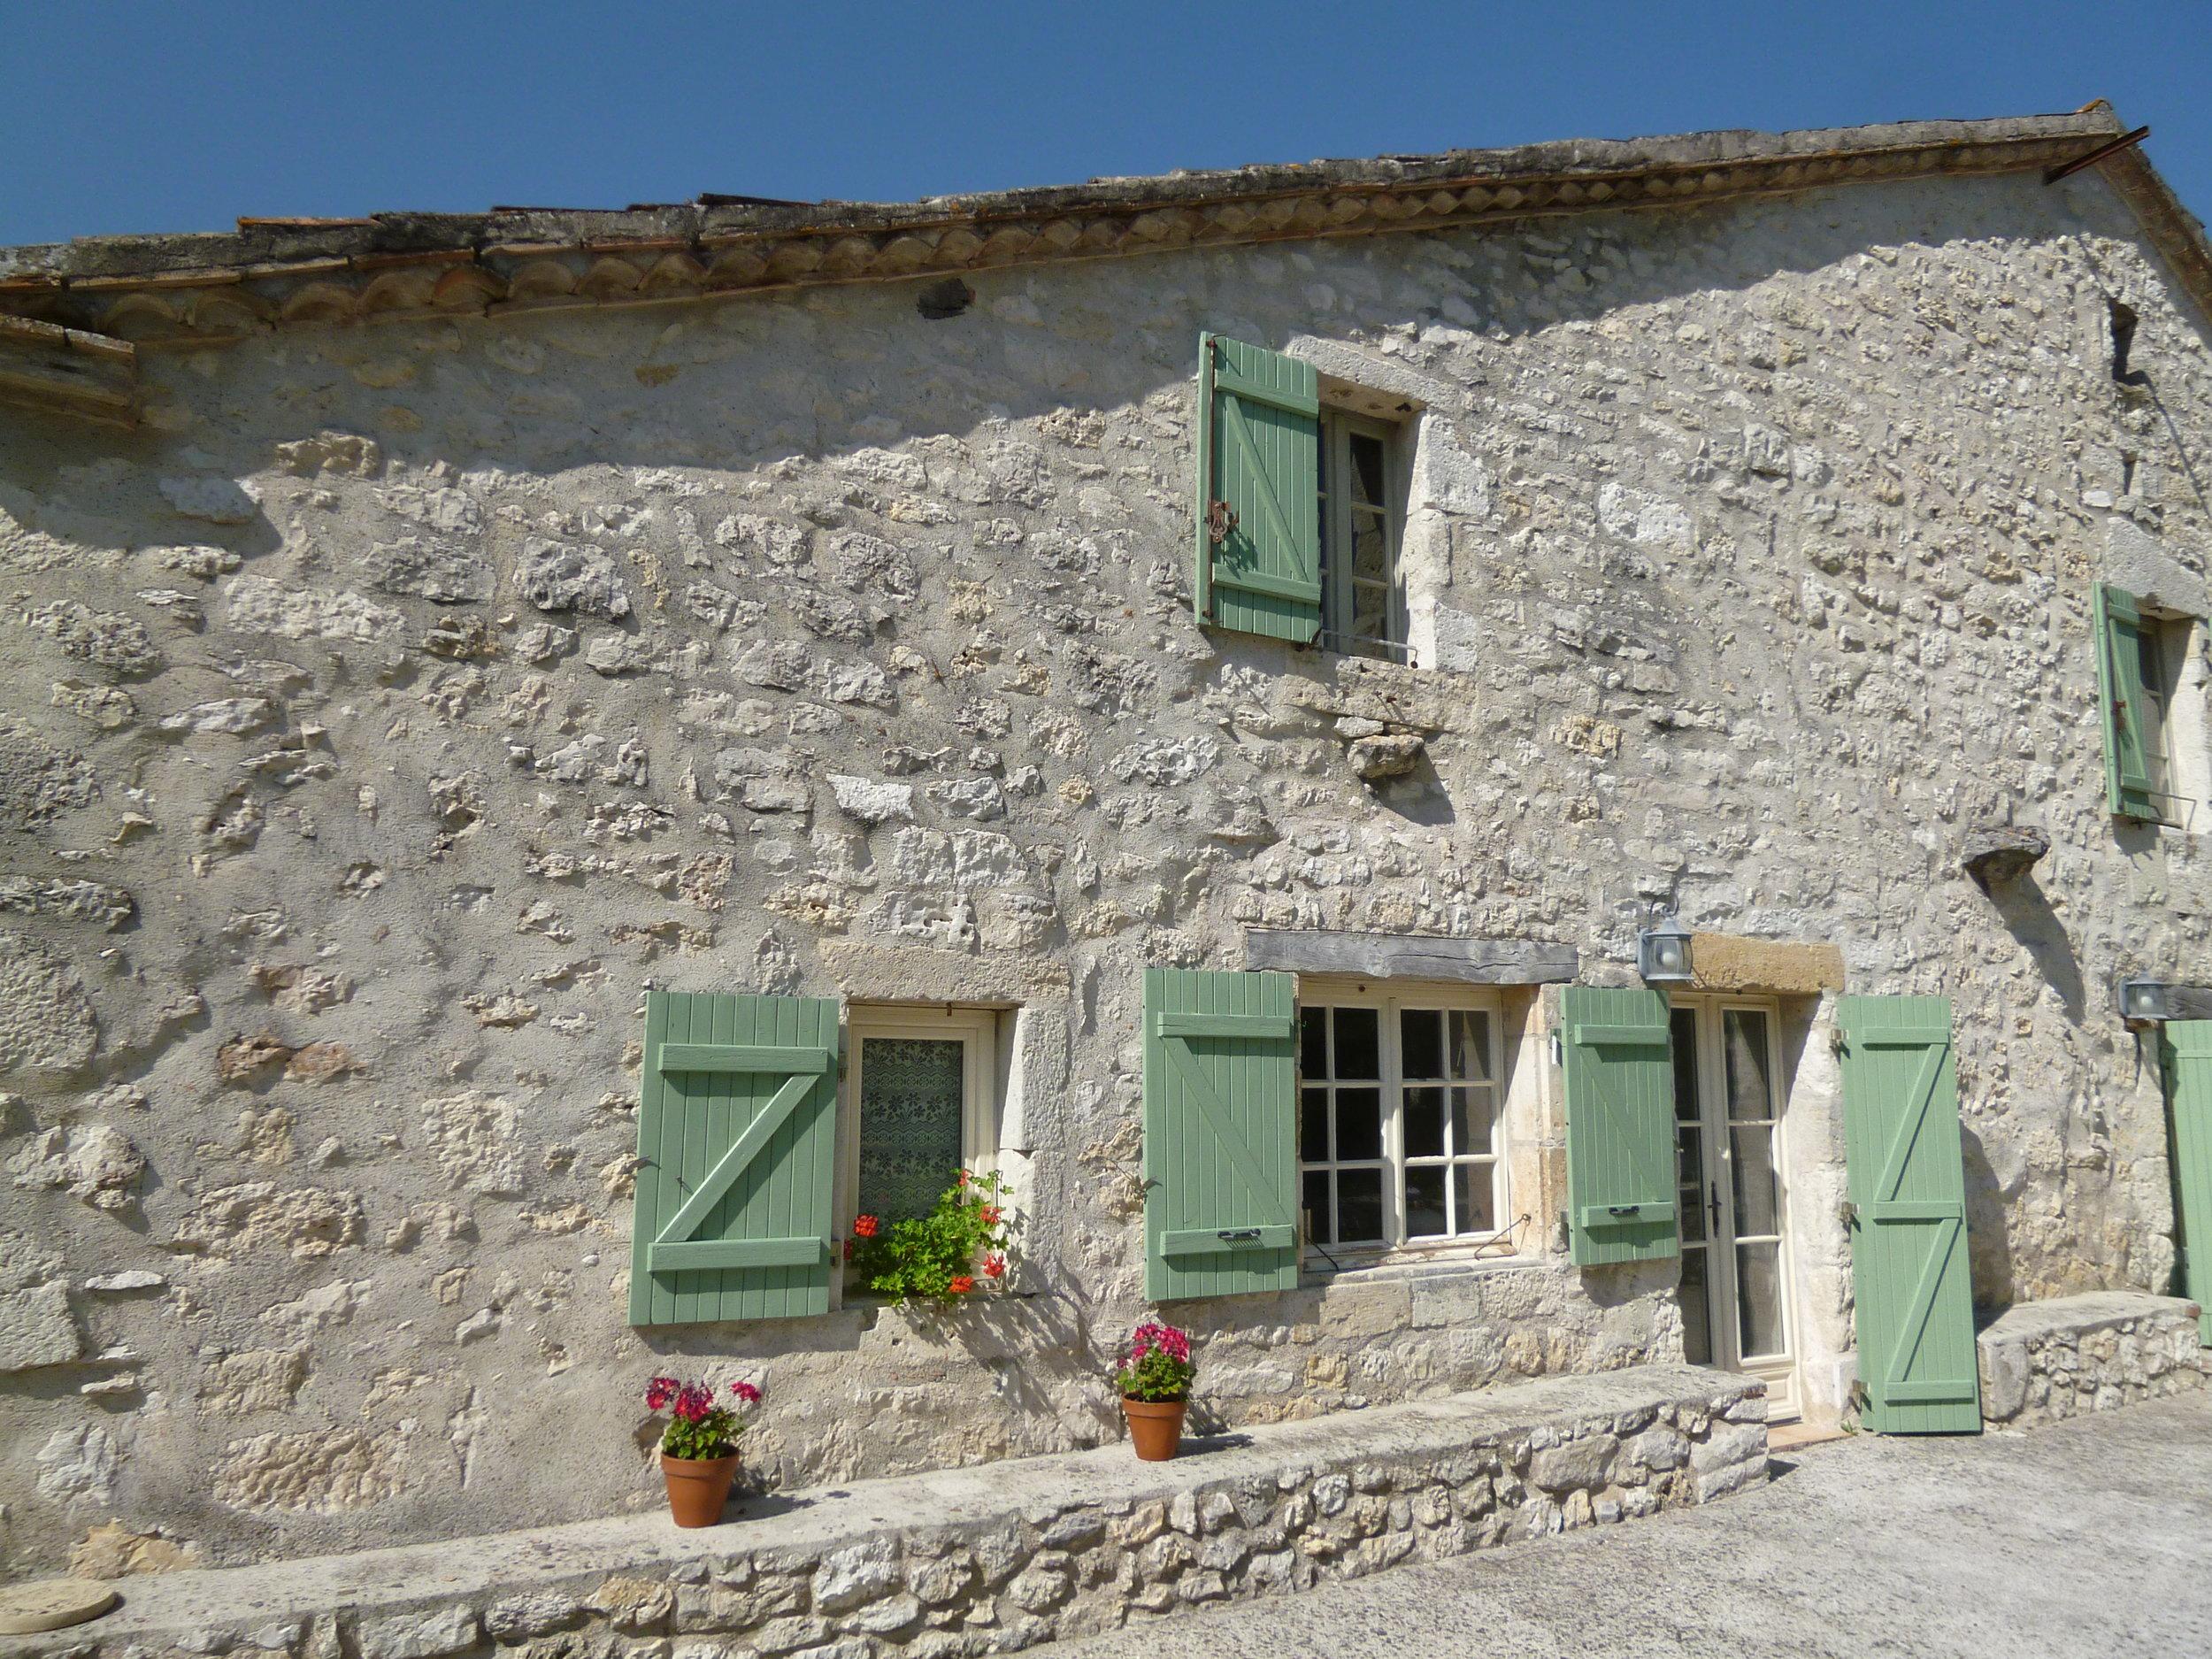 The French Farmhouse.